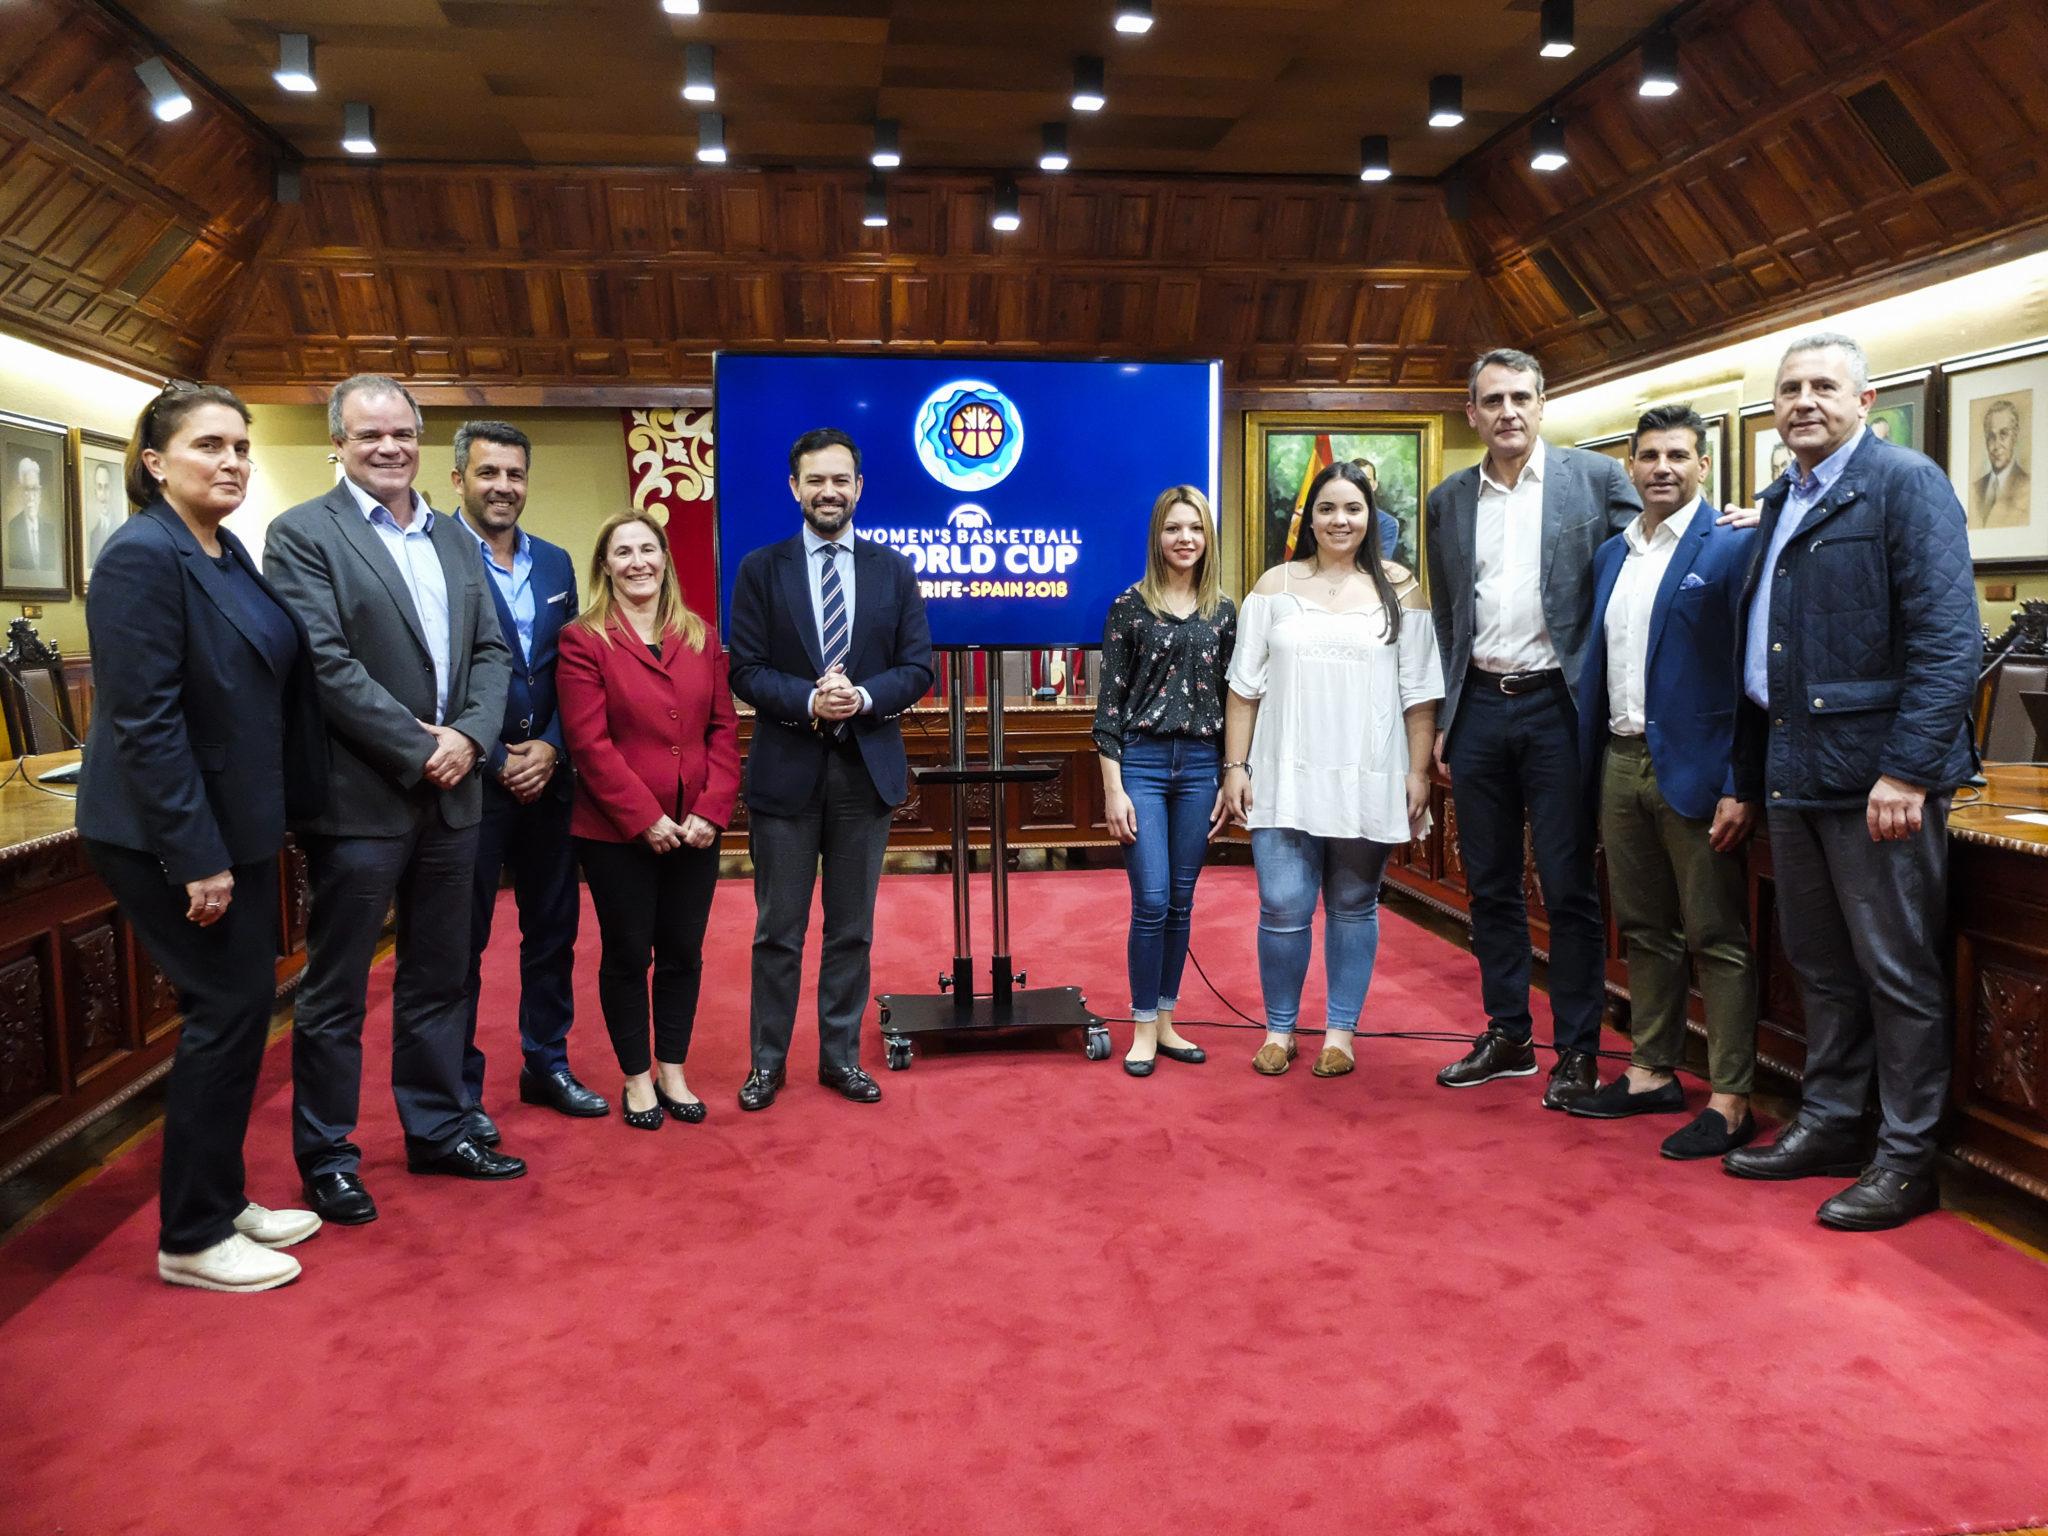 Recepcion representantes mundial de baloncesto femenino